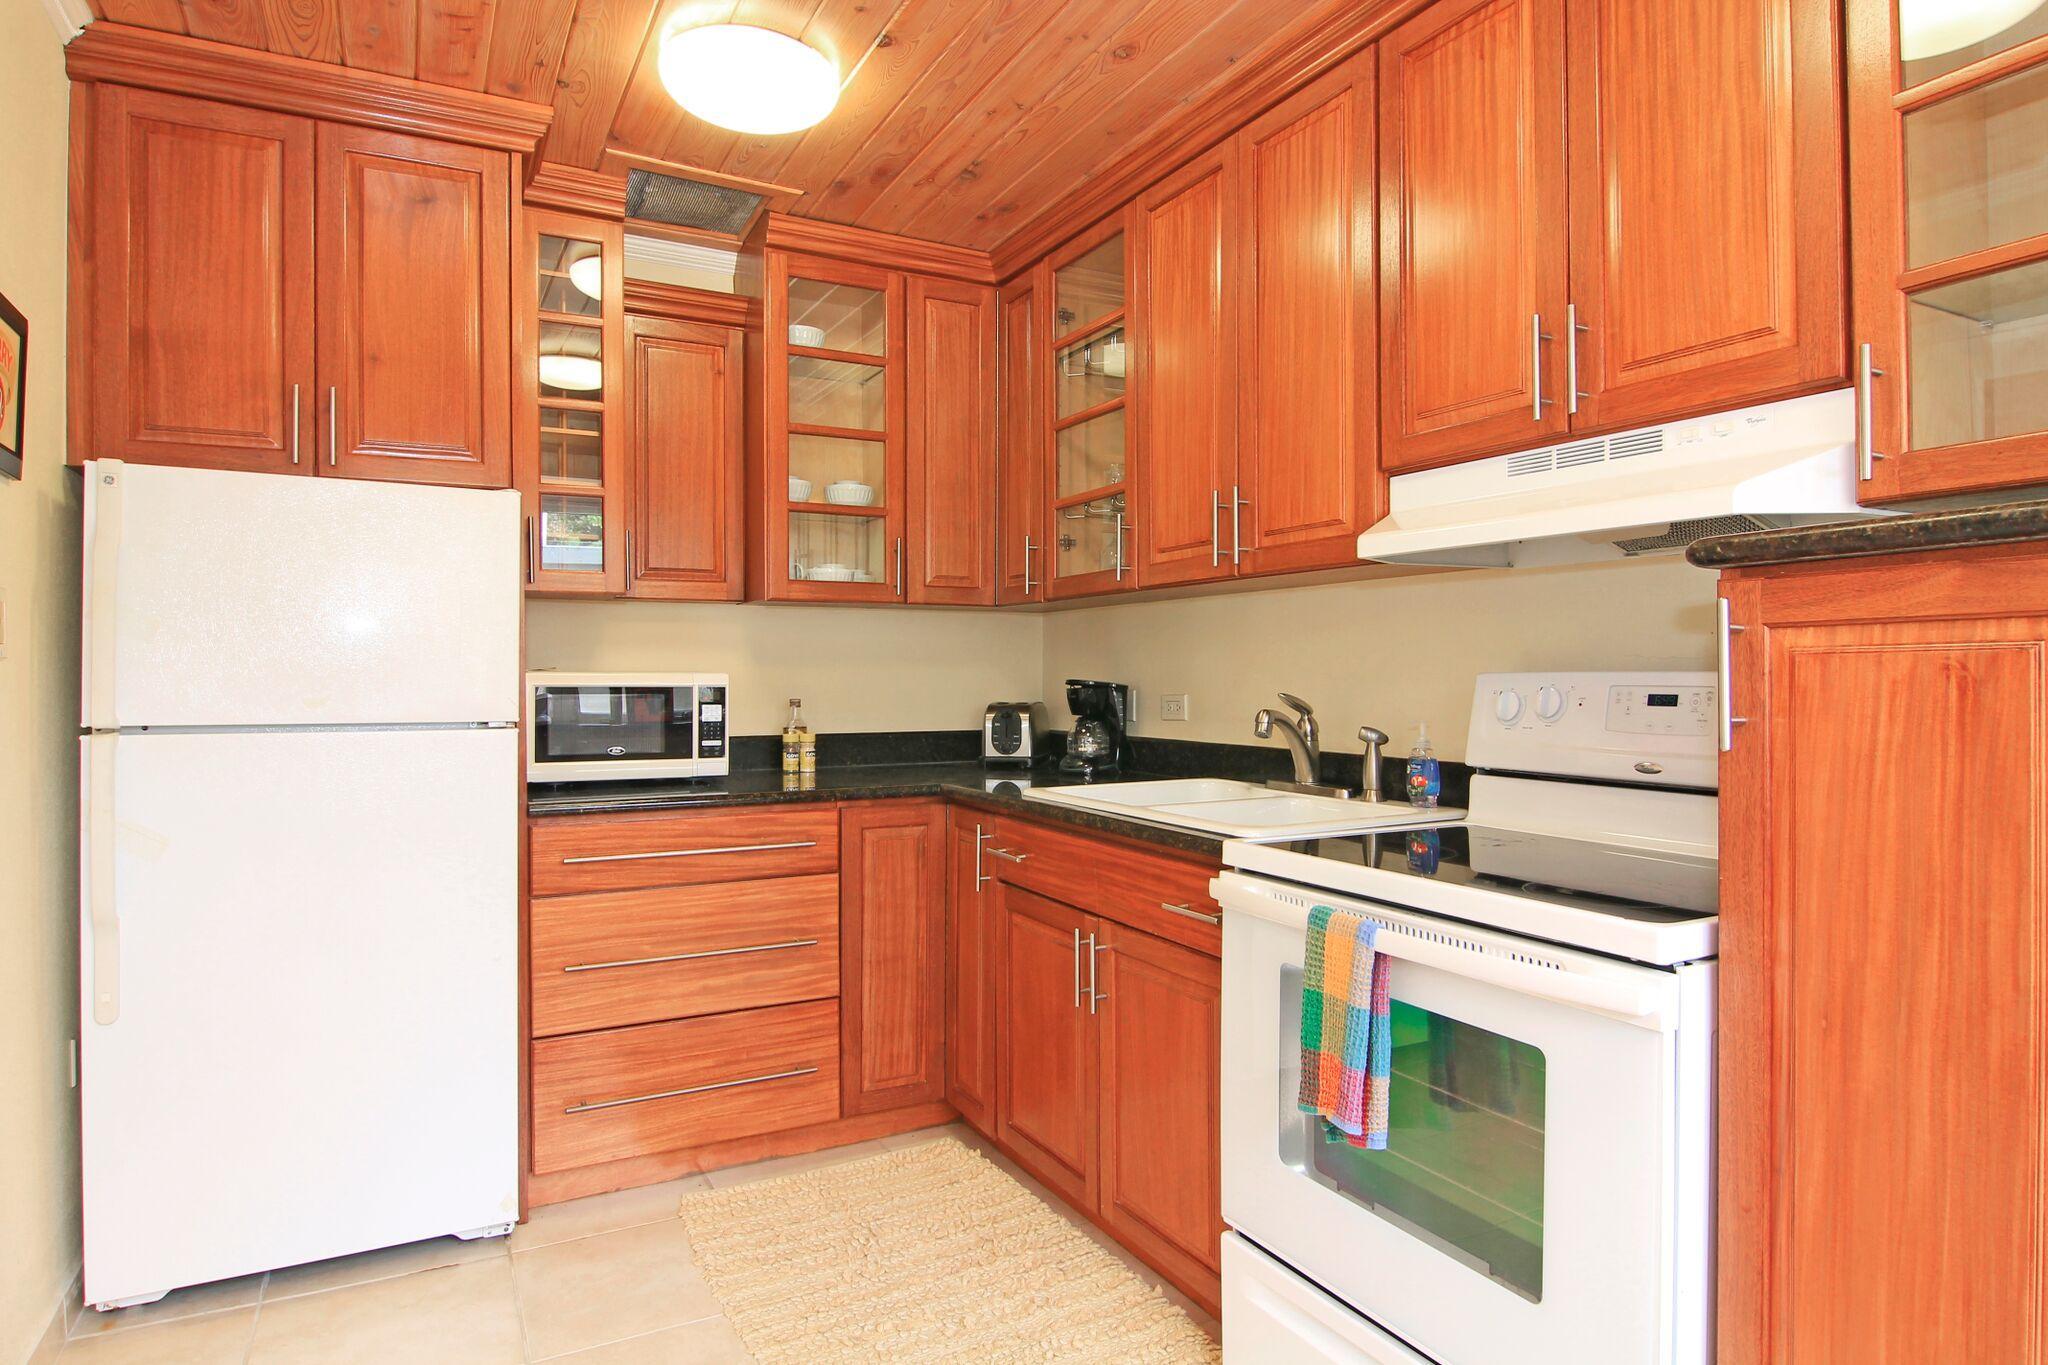 Kitchen - Custom Cabinetry